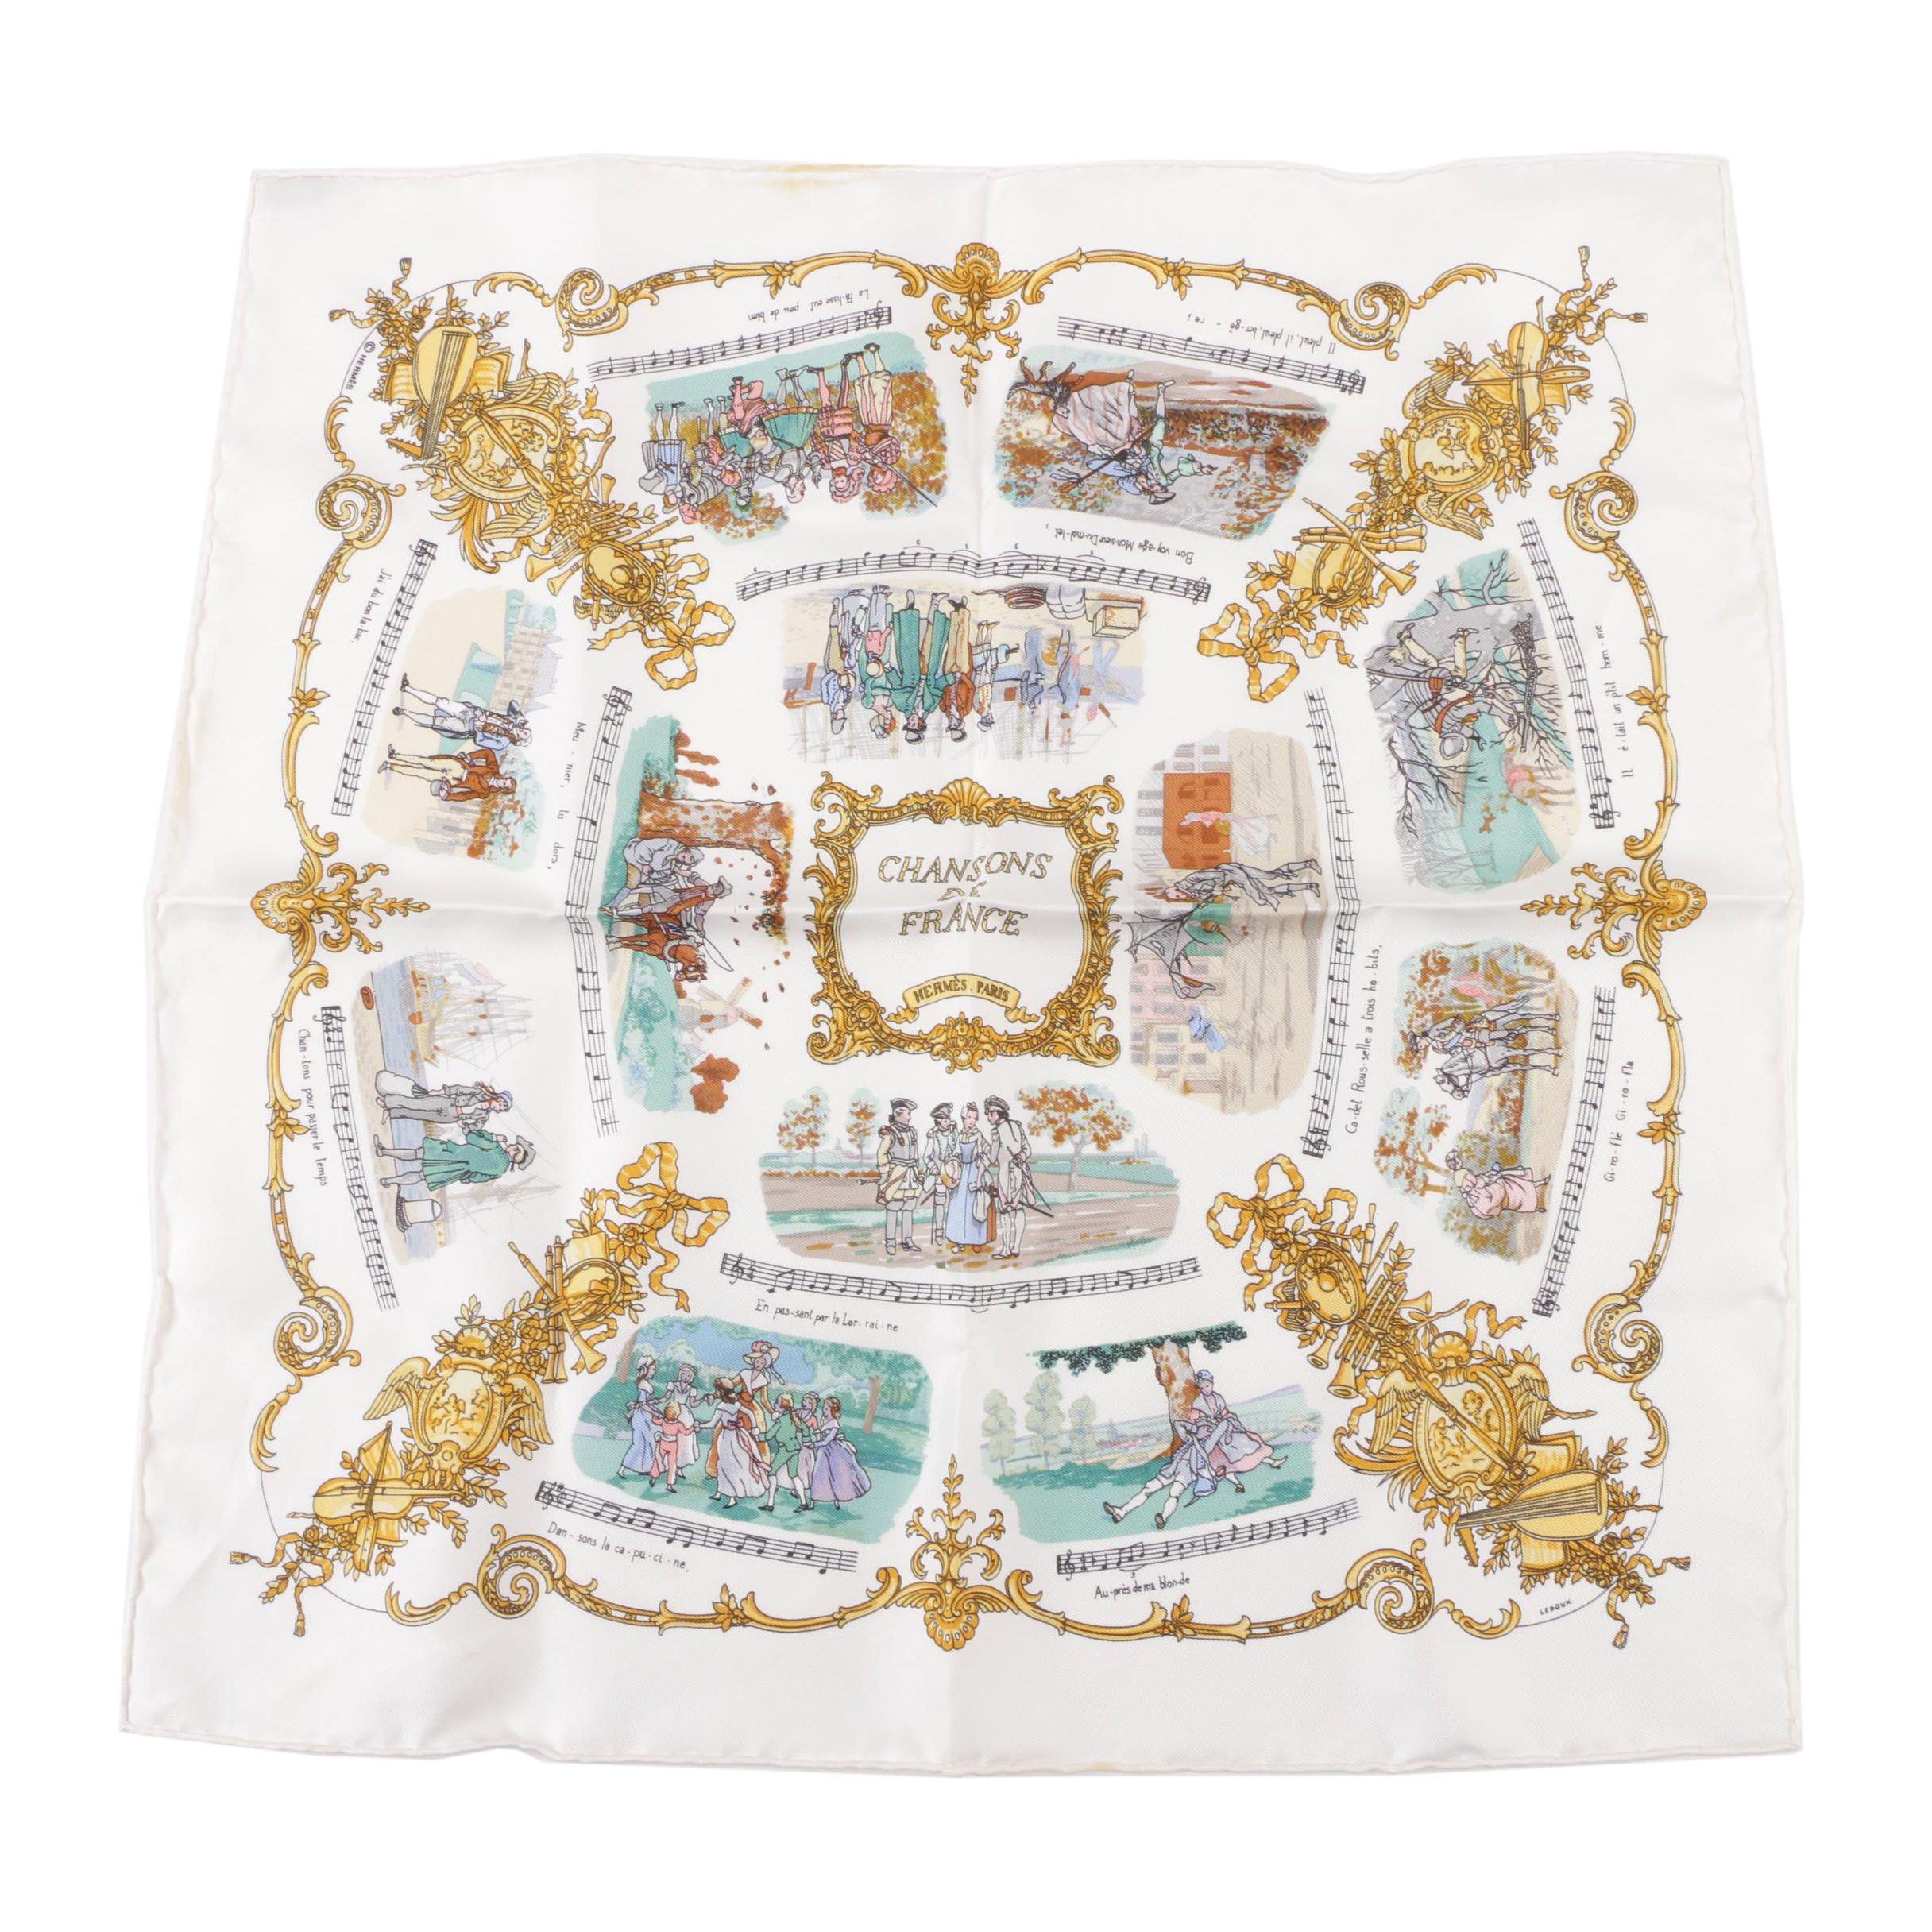 "Hermès ""Chansons de France"" by Philippe Ledoux Silk Pocket Square with Box"